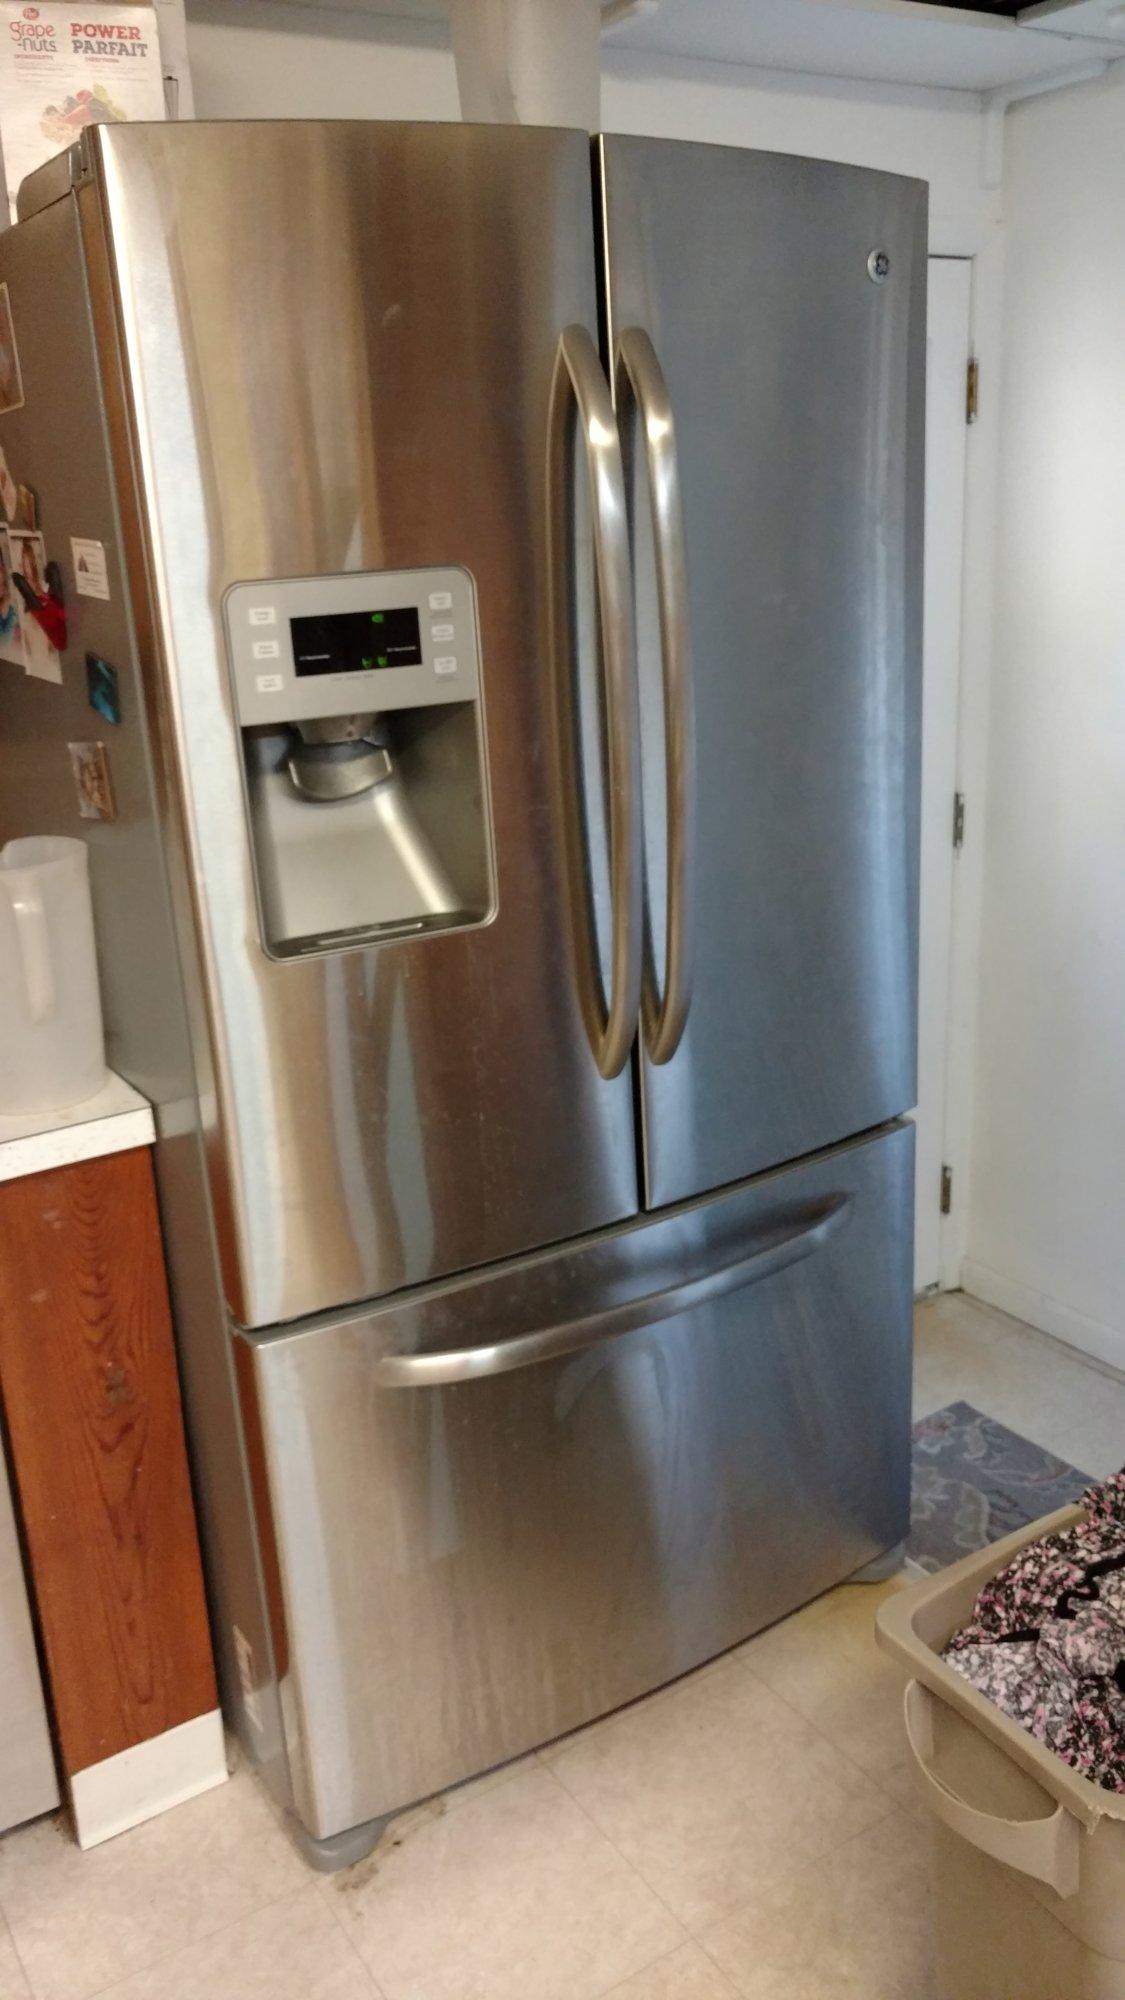 Gfss6kkycss Ge Refrigerator 600 Repair And It Is Still Not Fixed Applianceblog Repair Forums